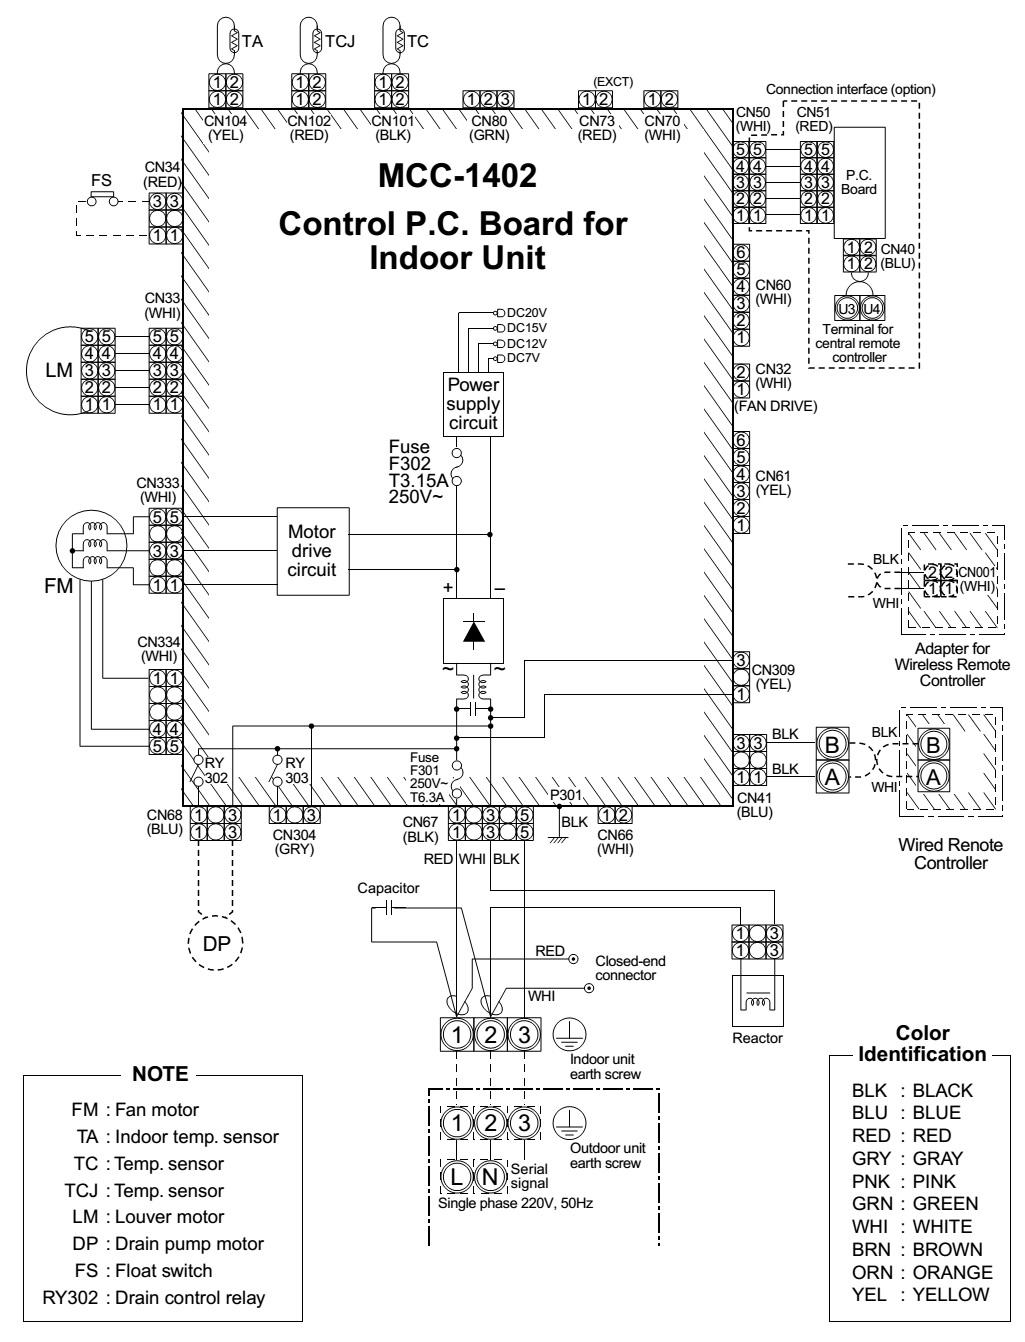 split ac indoor unit motor wiring diagram lutron dimmer switch toshiba air conditioner rav sm562at sm1402at